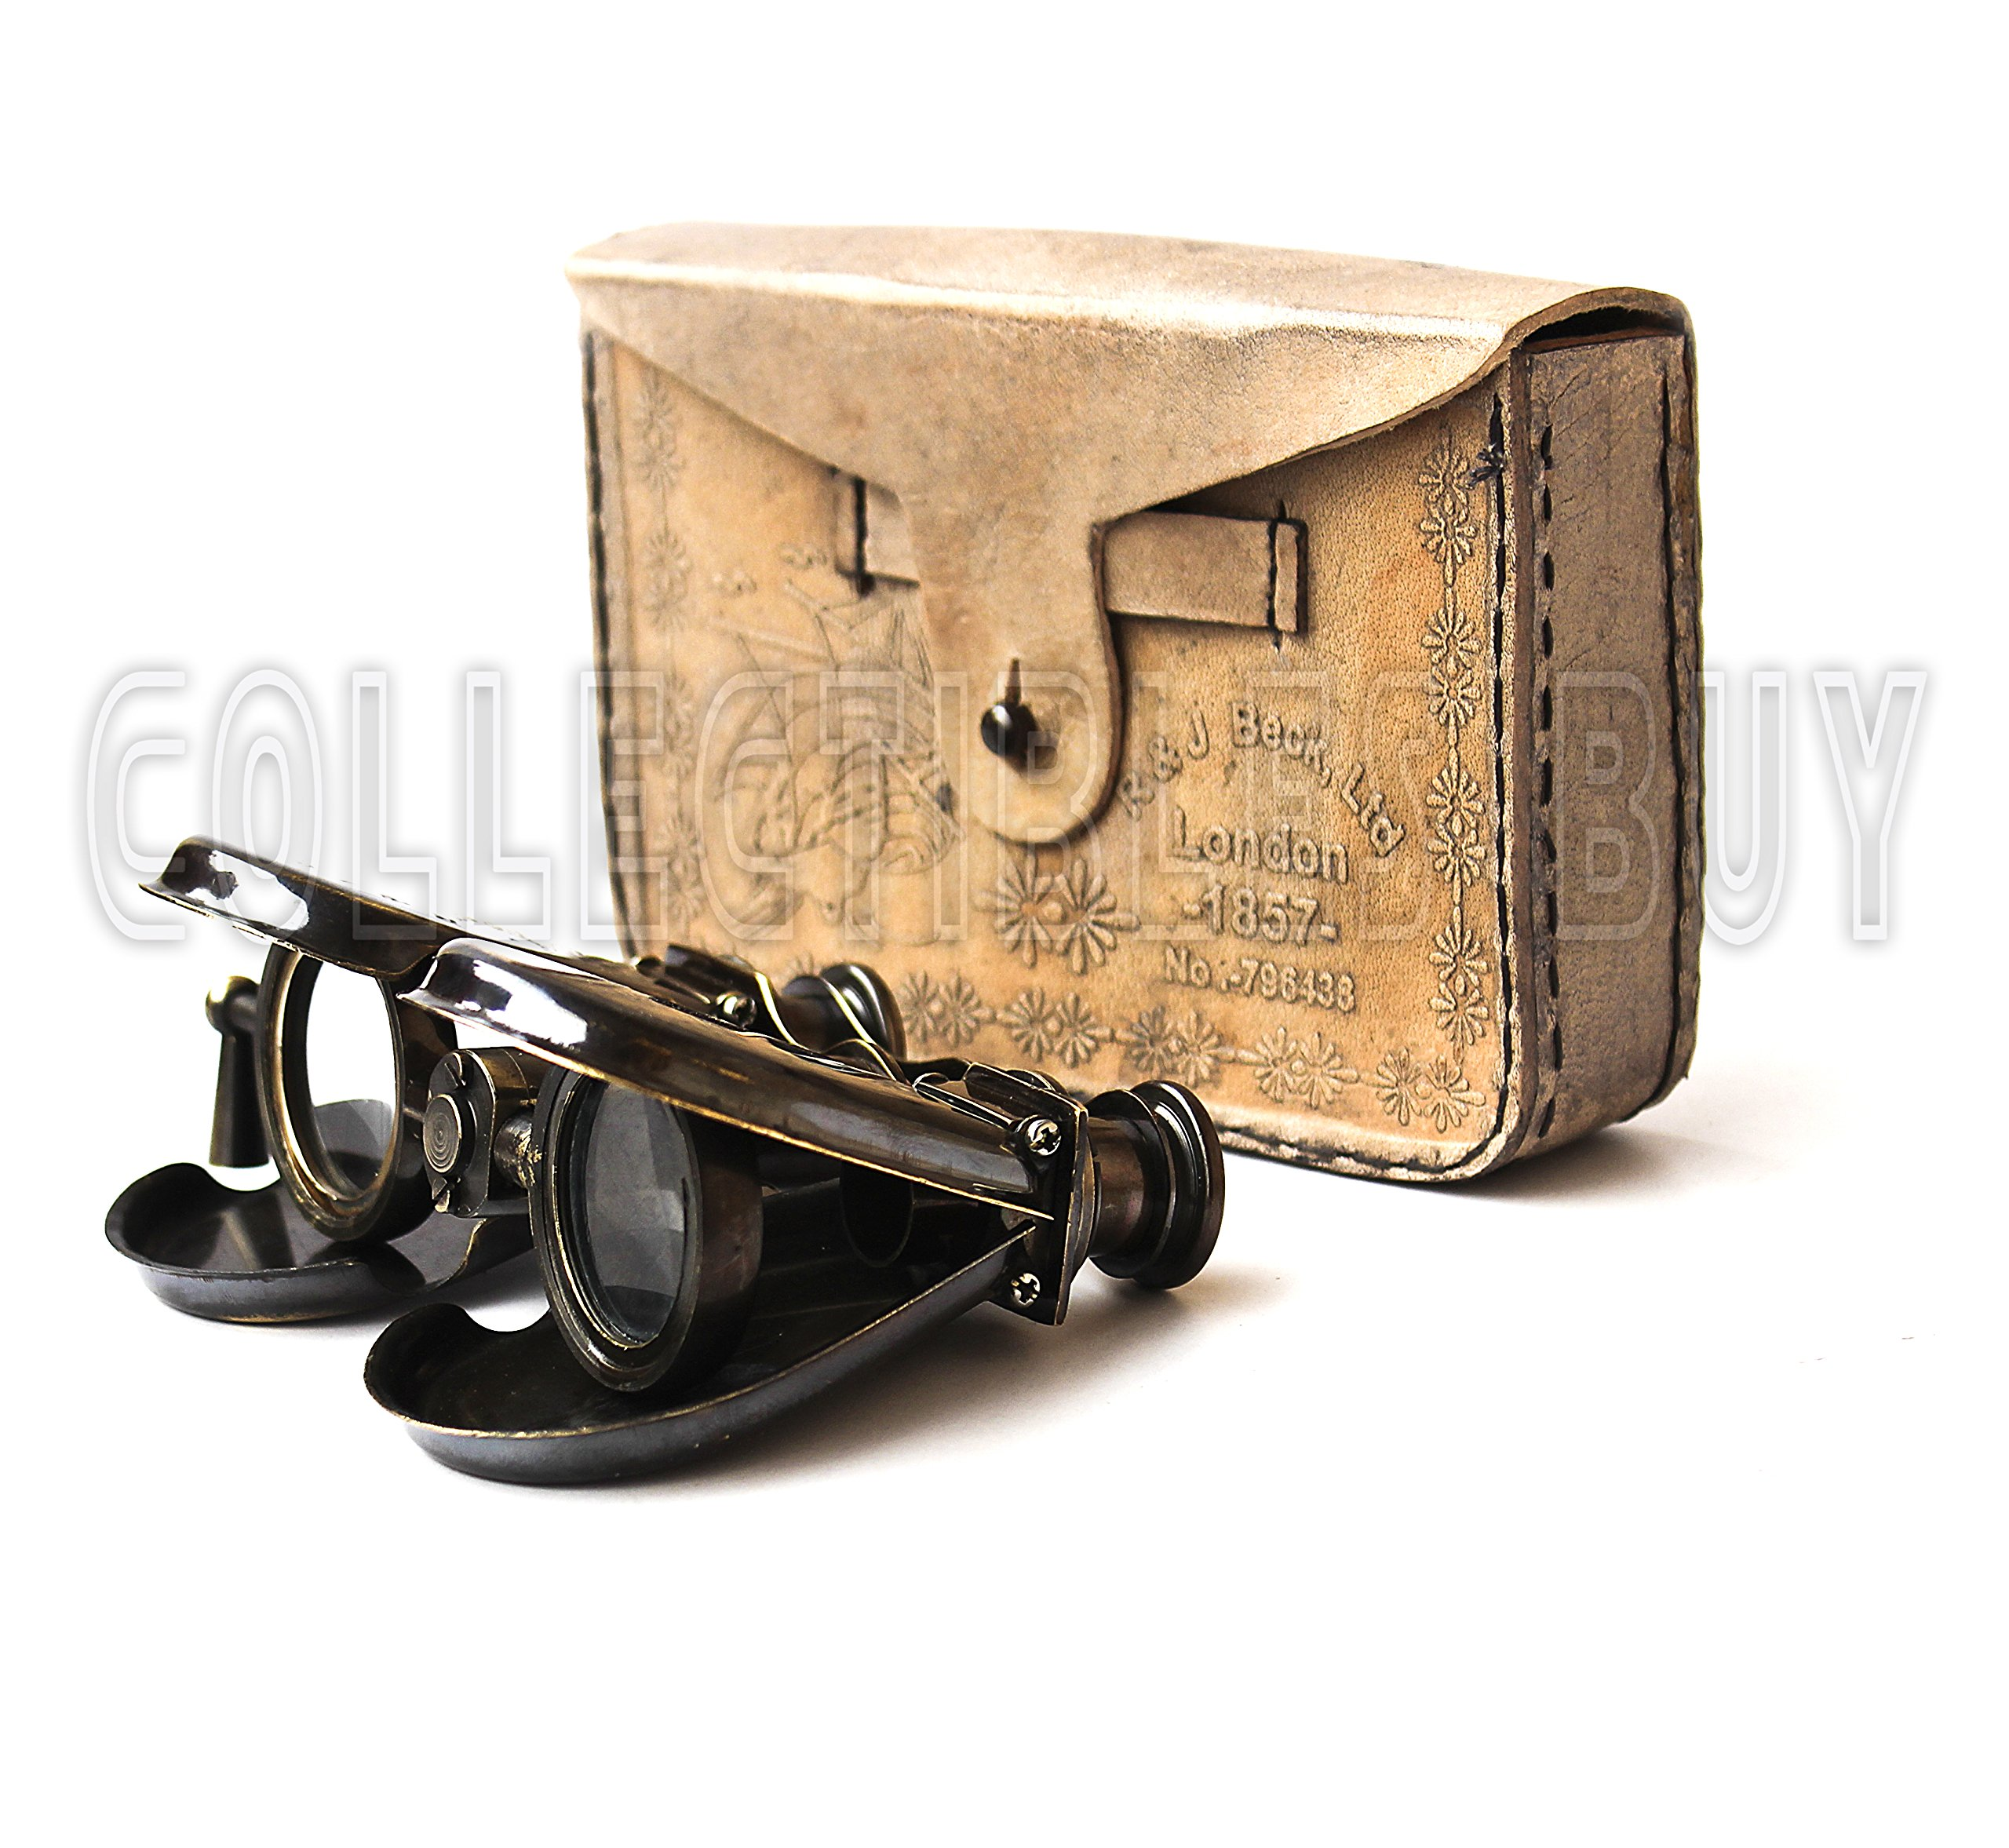 Classic Marine Spy Glass Antique London 1857 R & J Beck Brass Binocular Collectibles Gift